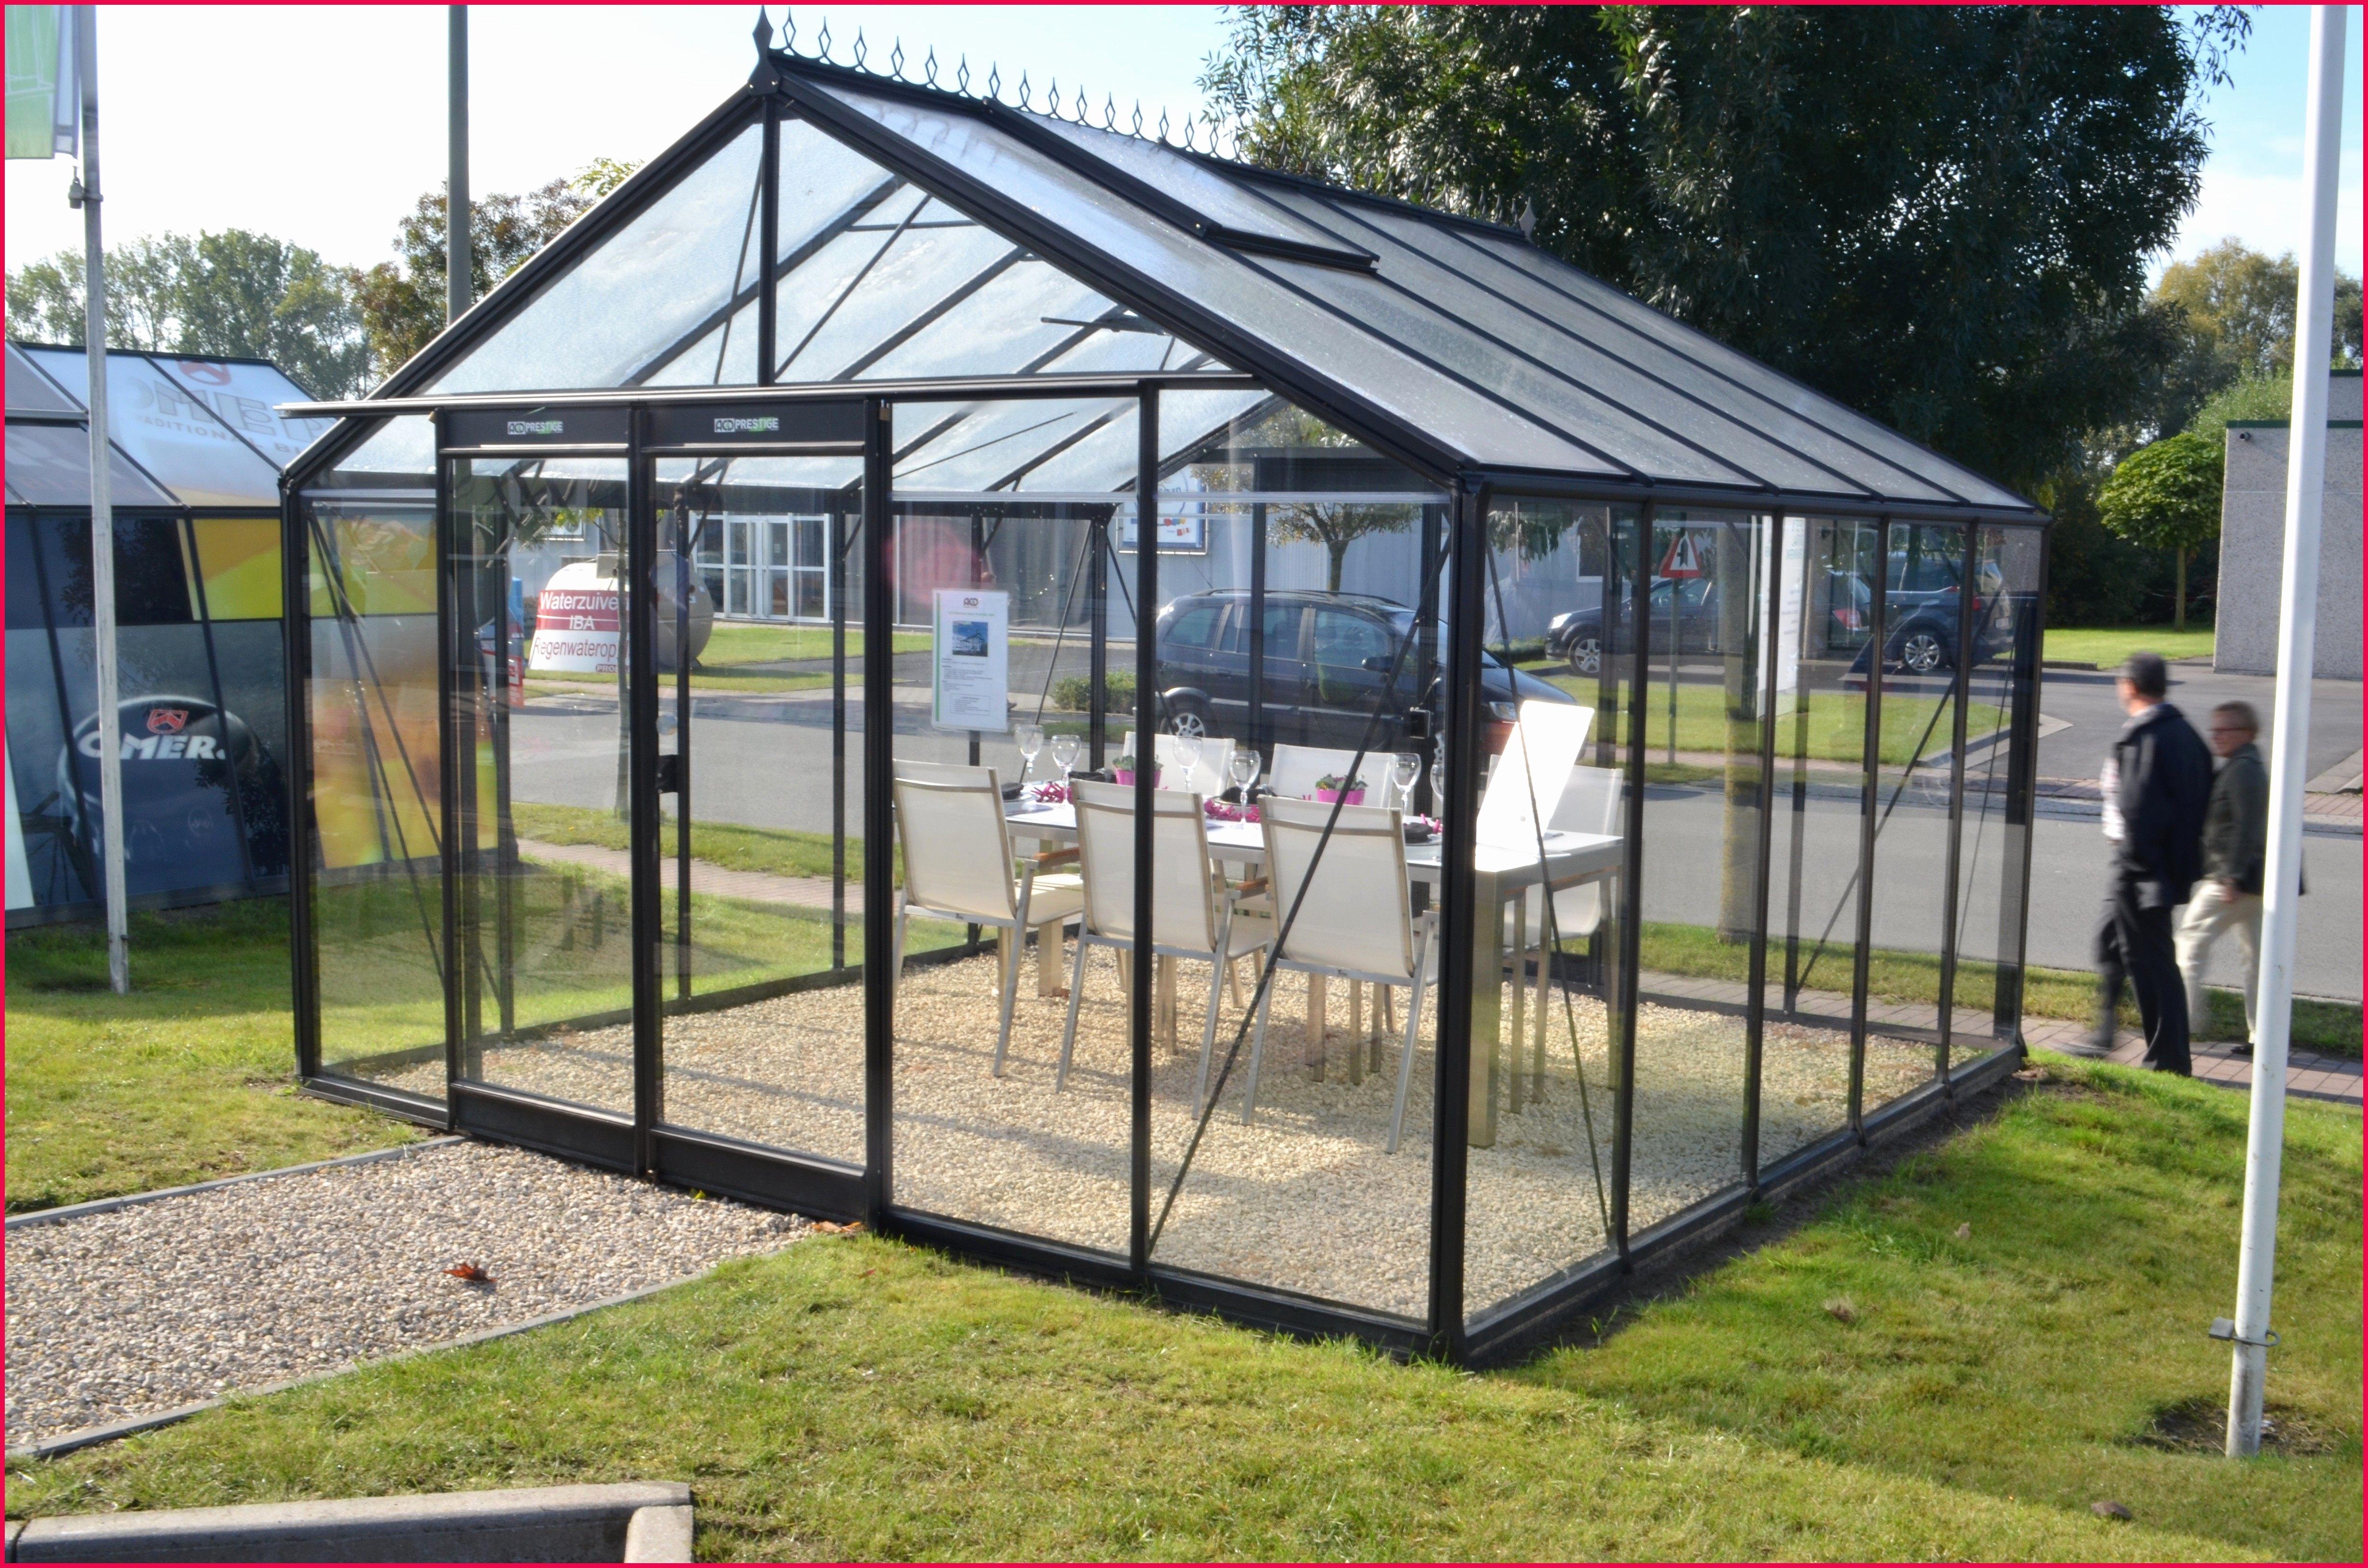 Fabriquer Serre De Jardin Polycarbonate Beau Photos Fabriquer Une Mini Serre De Jardin Pour élégant Fabriquer Serre De